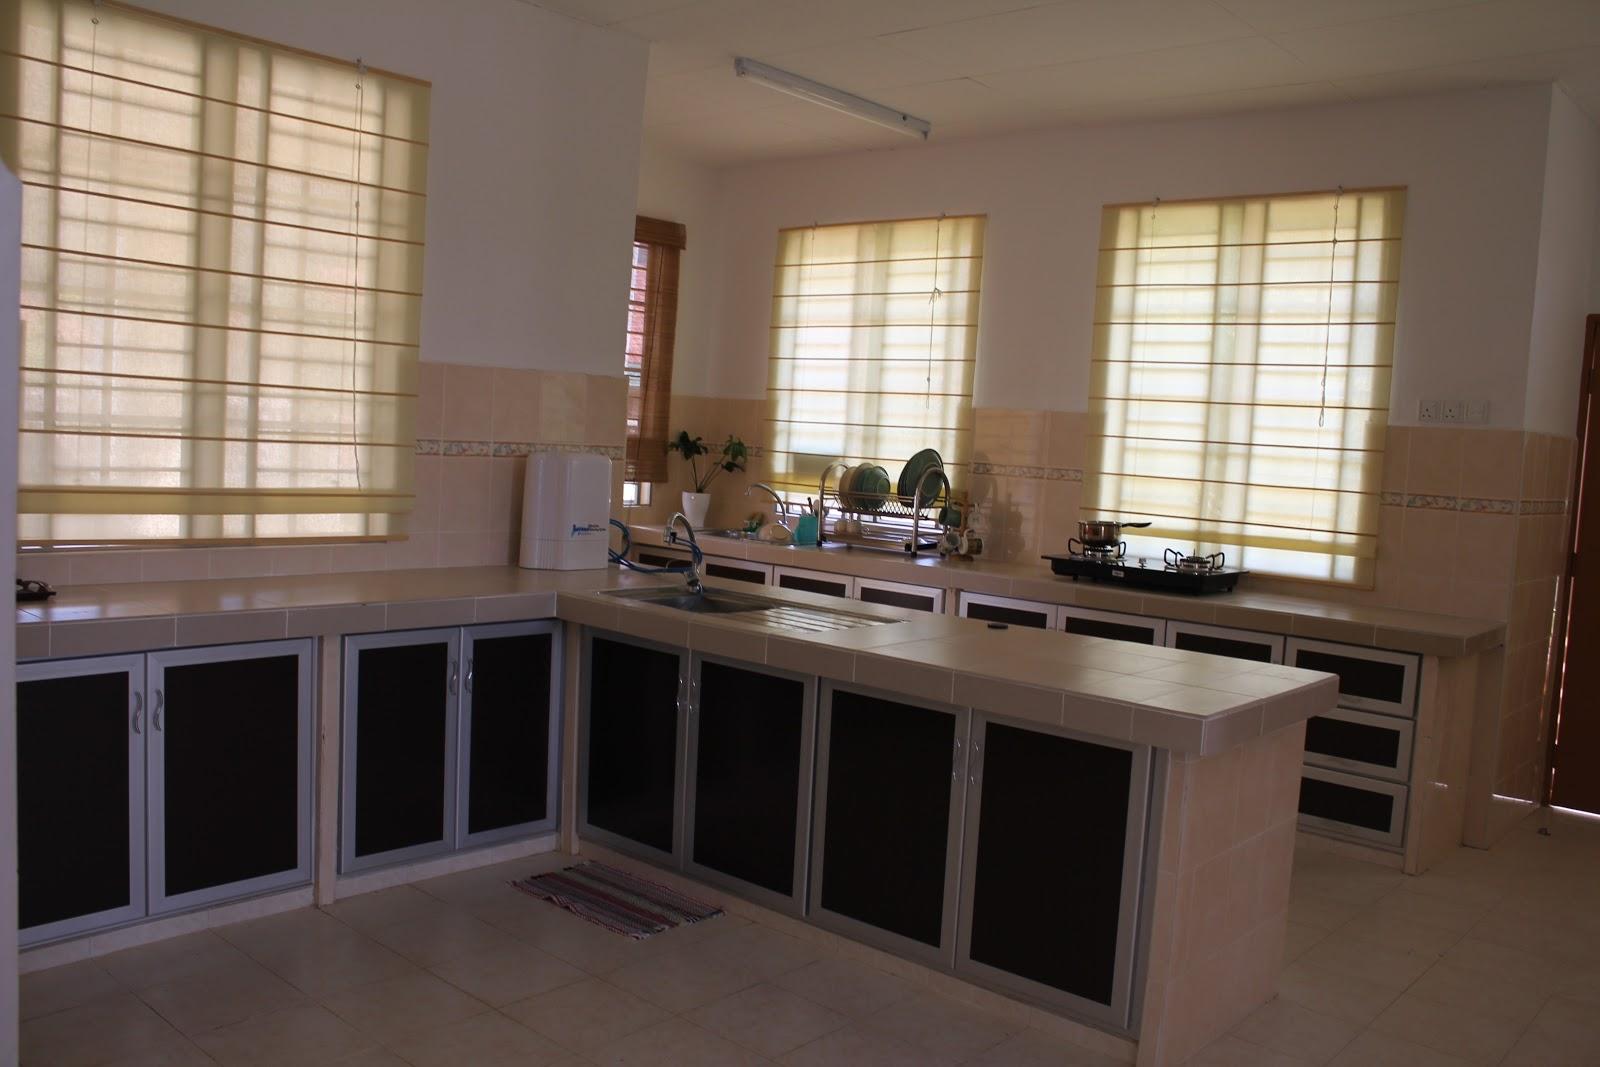 gambar dapur basah submited images